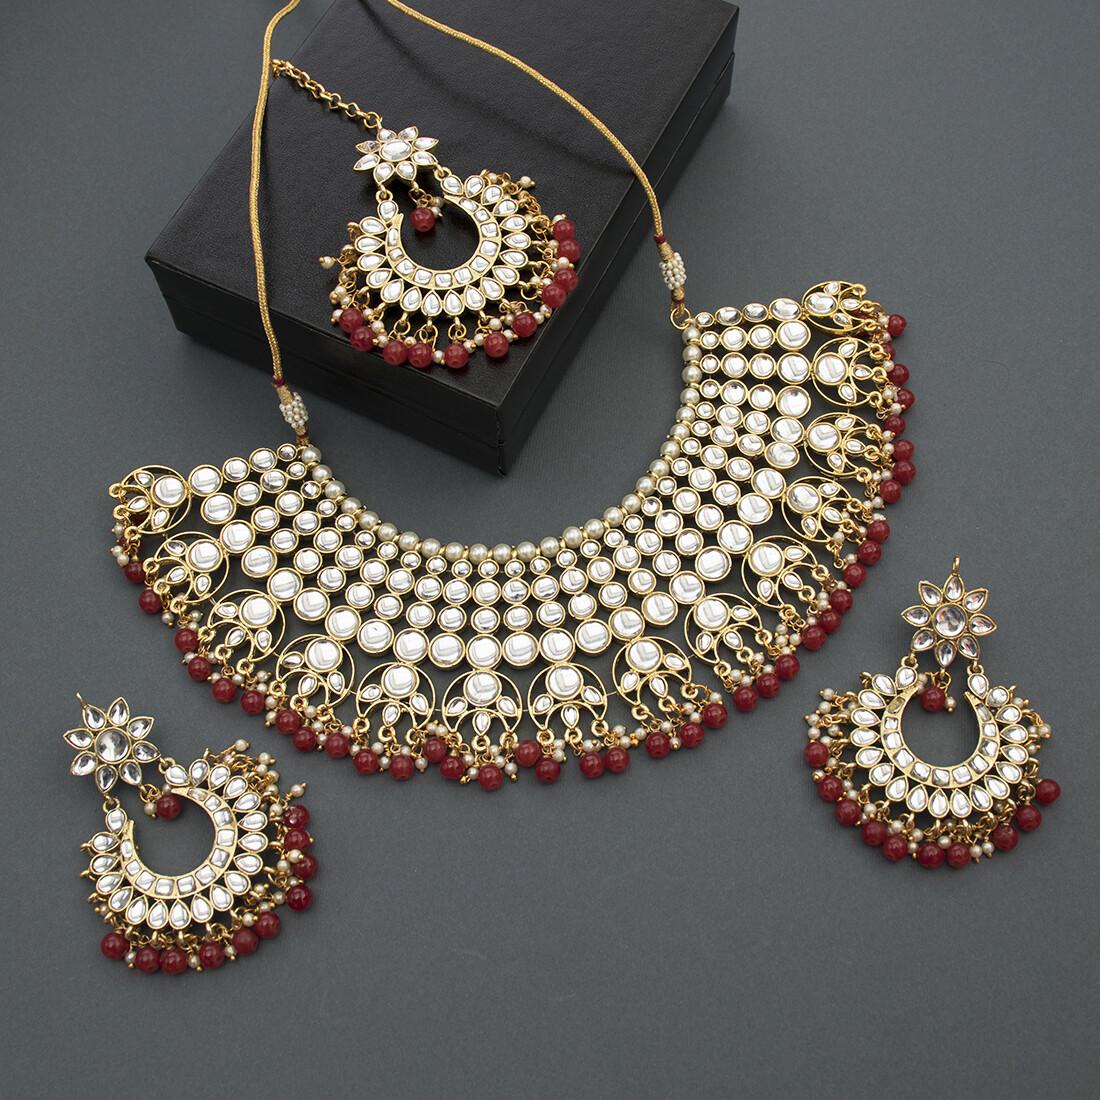 Aheli Party Wear Faux Kundan Pearl Beaded Necklace Earrings And Mang Tikka  Jewelry Set